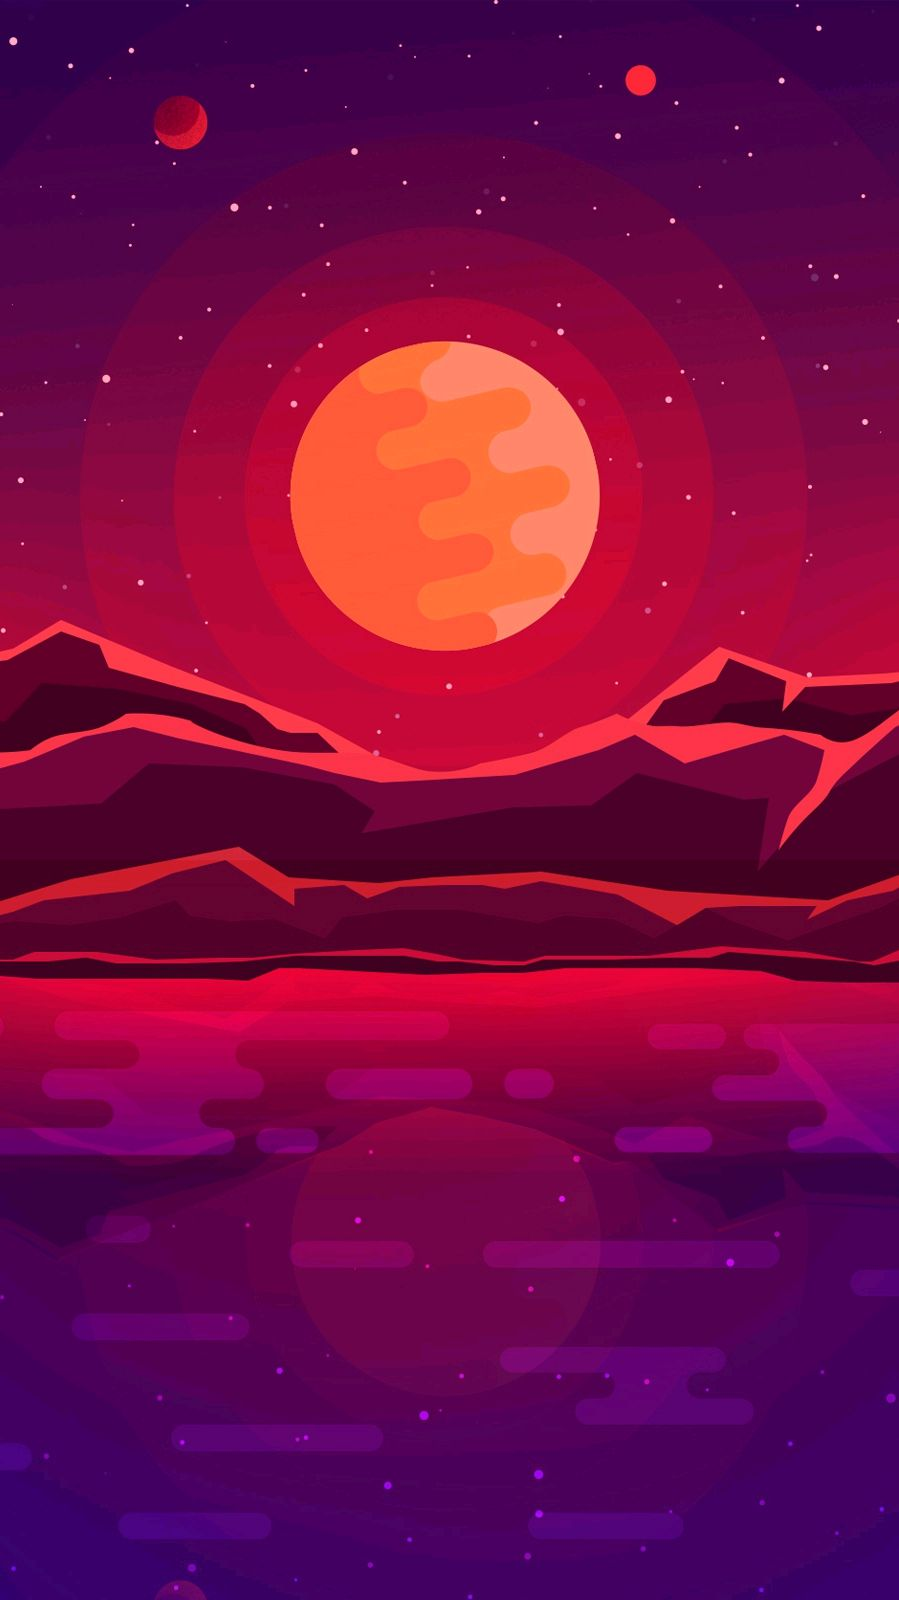 Images Of Cute Wallpapers For Phone Digital Sunrise Minimal Art Iphone Wallpaper Iphone